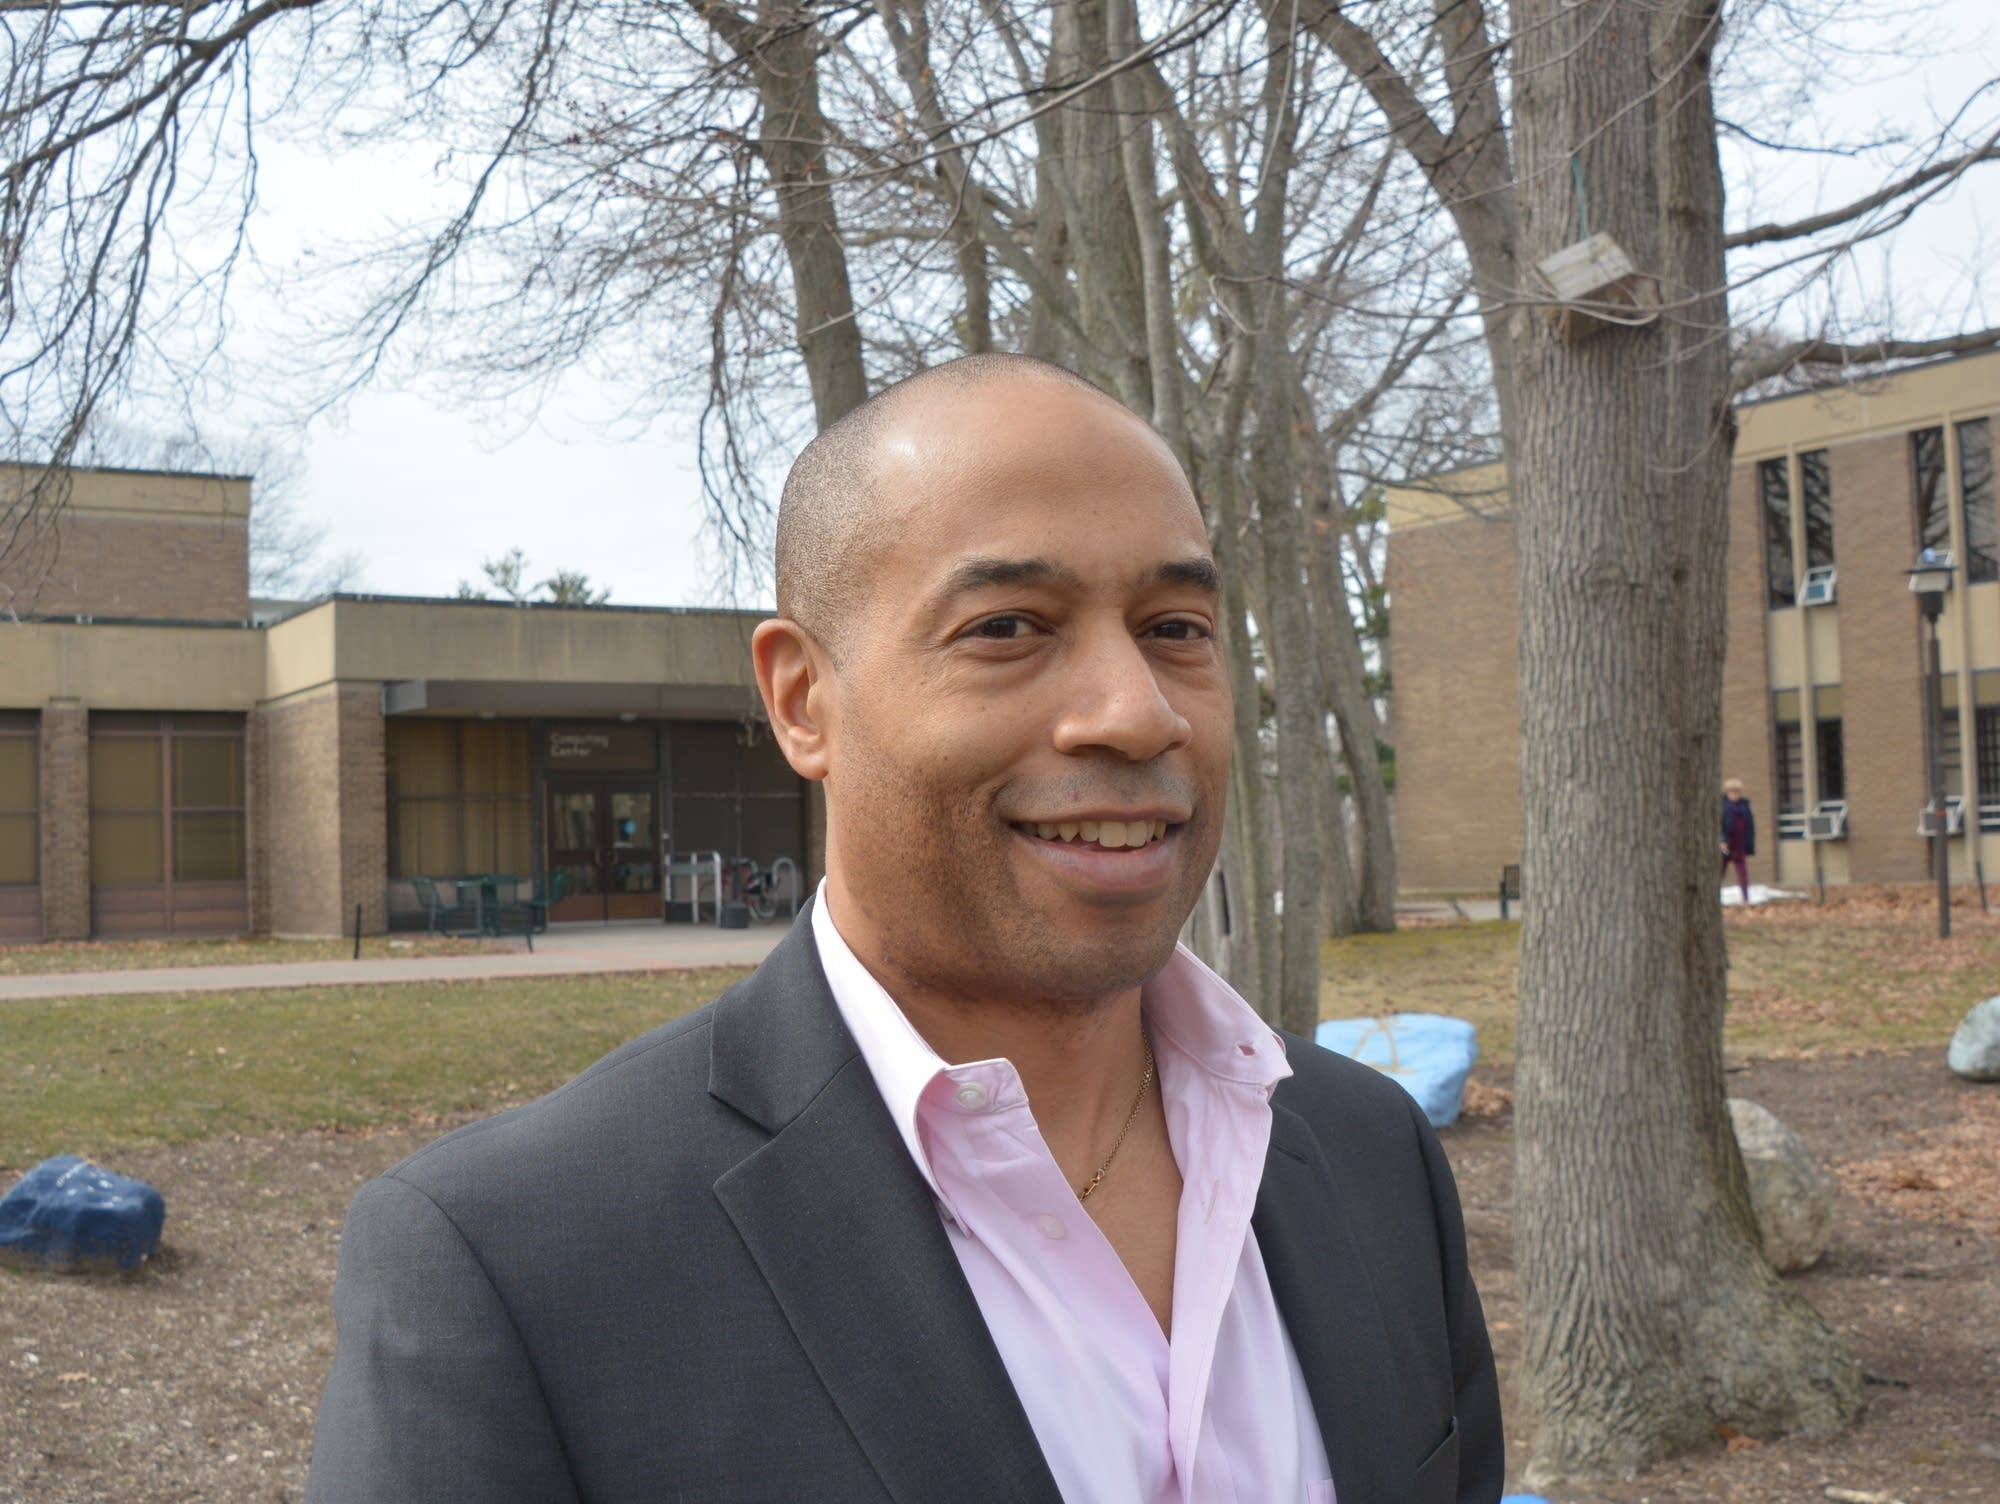 Derek Peterson, Stony Brook University class of 1988.